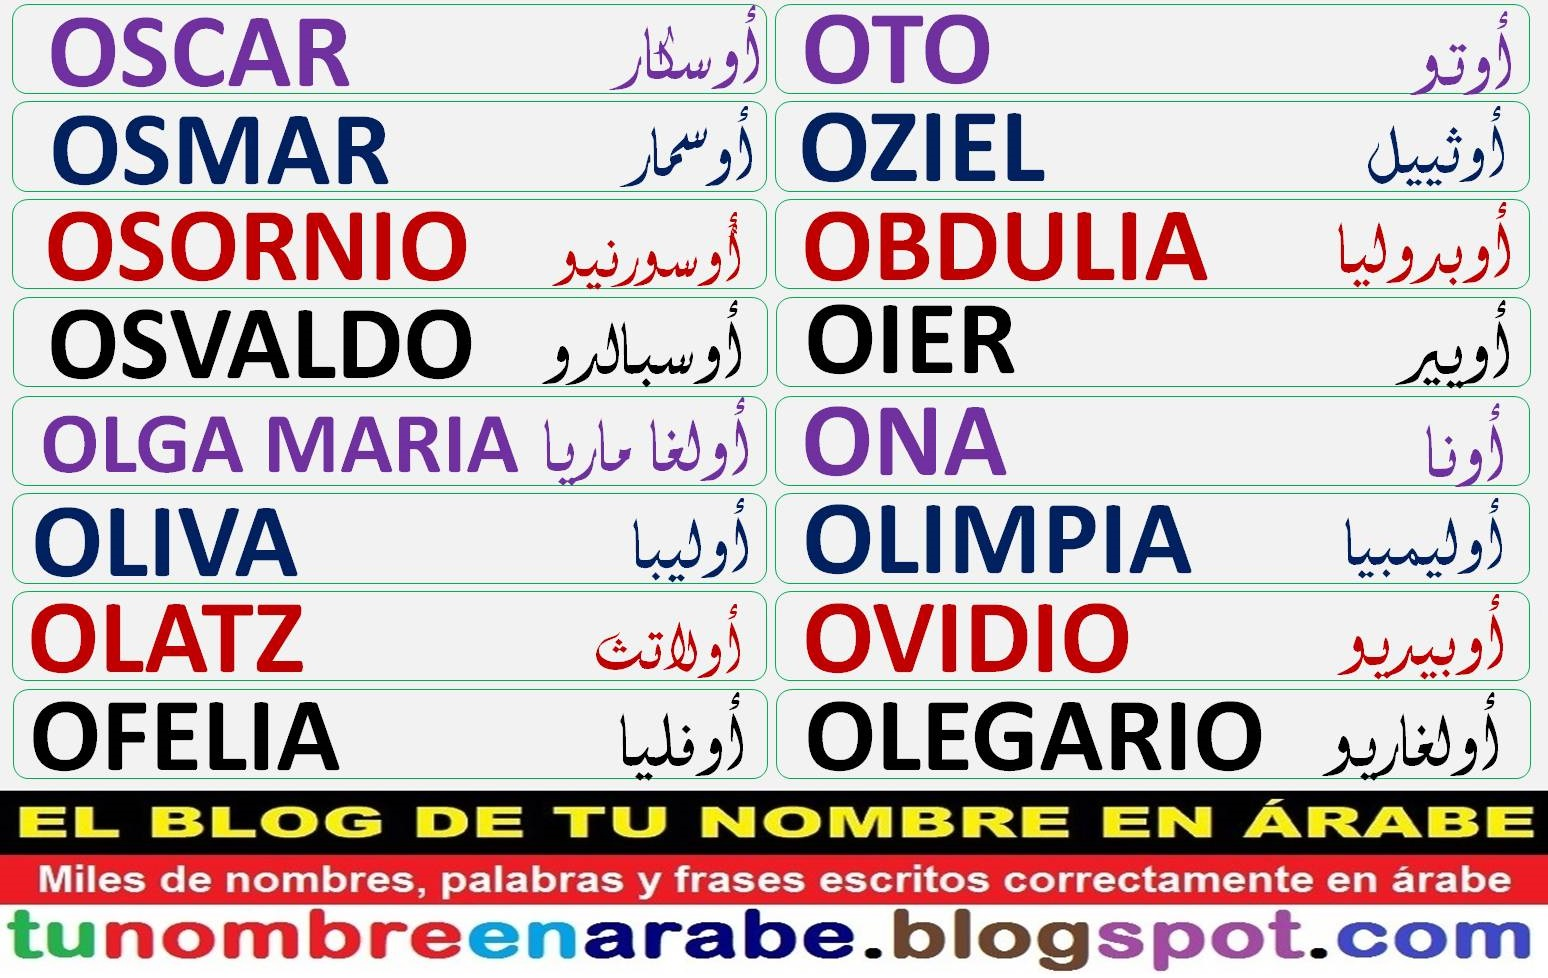 Lijst van Santomese ministers van Buitenlandse Zaken moreover 291622148028 additionally Honduras Los Horcones Masacre furthermore Tunombreenarabe blogspot also 112301 Observacion De Clase. on oscar ovidio videos